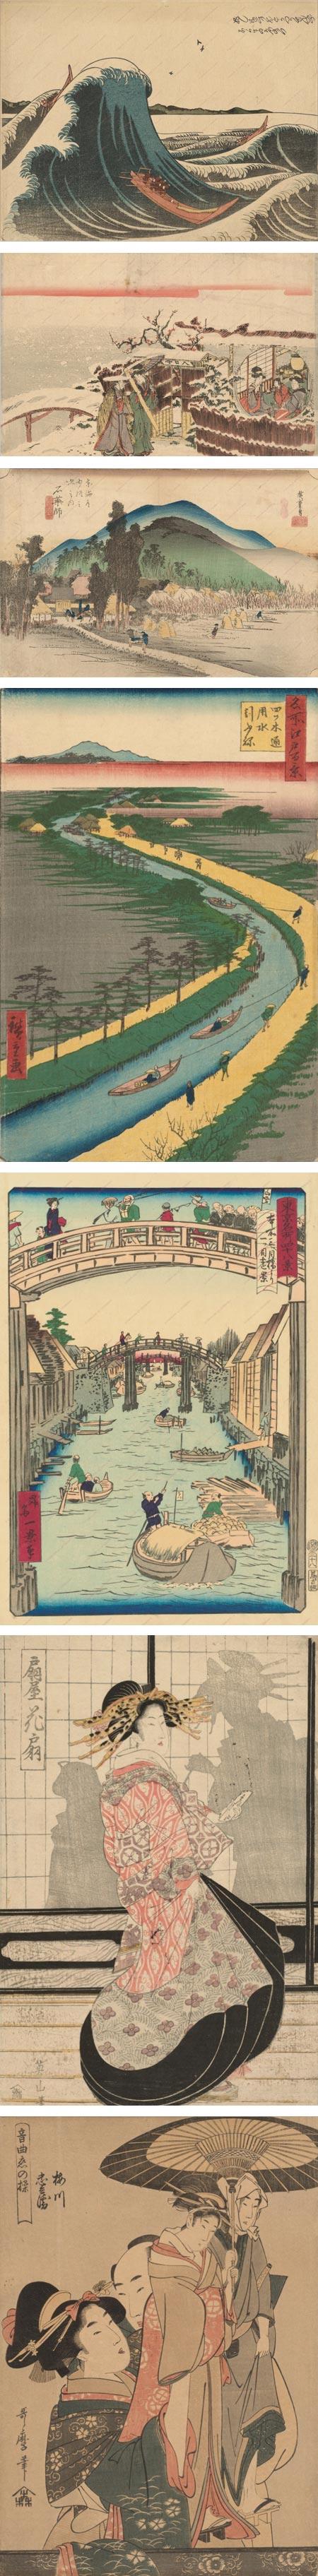 Japanese Prints from the 18th and 19th centuries: Katsushika Hokusai, Katsukawa Shunkō Ii, Utagawa Hirosige I, Utagawa Hirosige, Shosai Ikkei, Kikugawa Eiza, Kitagawa Utamaro